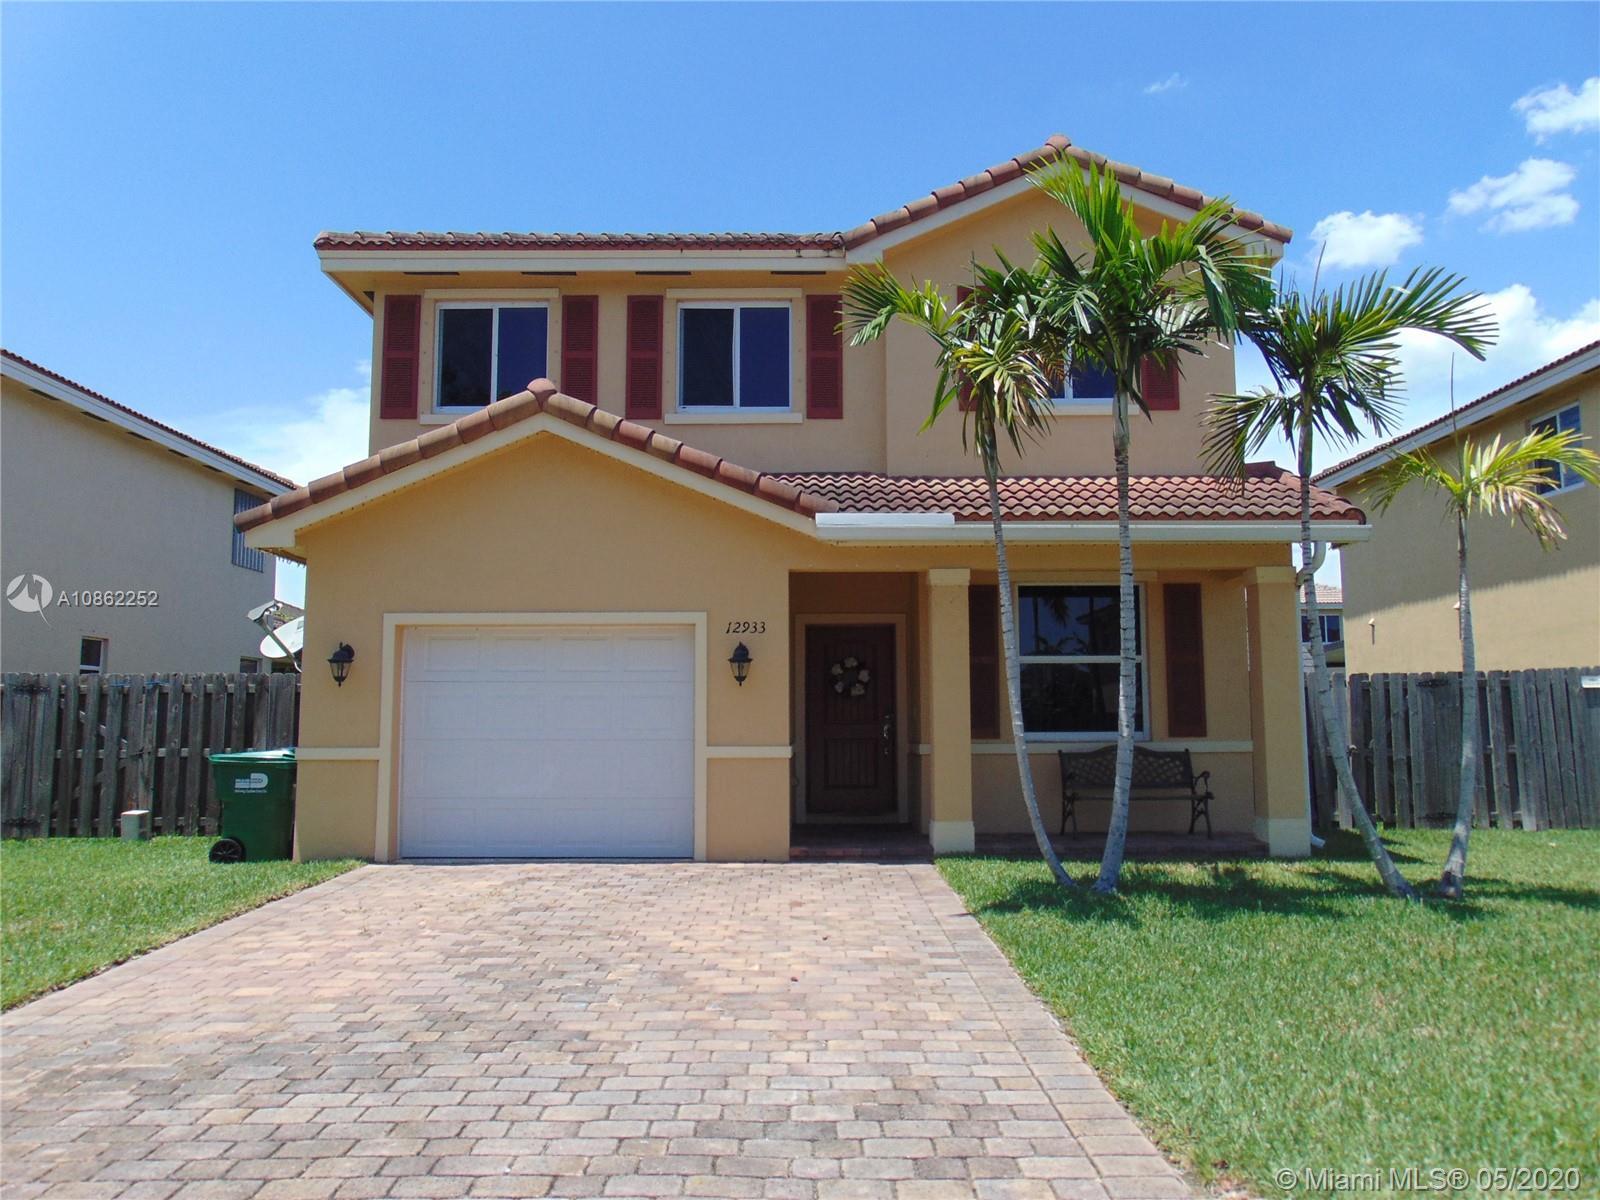 12933 SW 285th Ter, Homestead, FL 33033 - Homestead, FL real estate listing